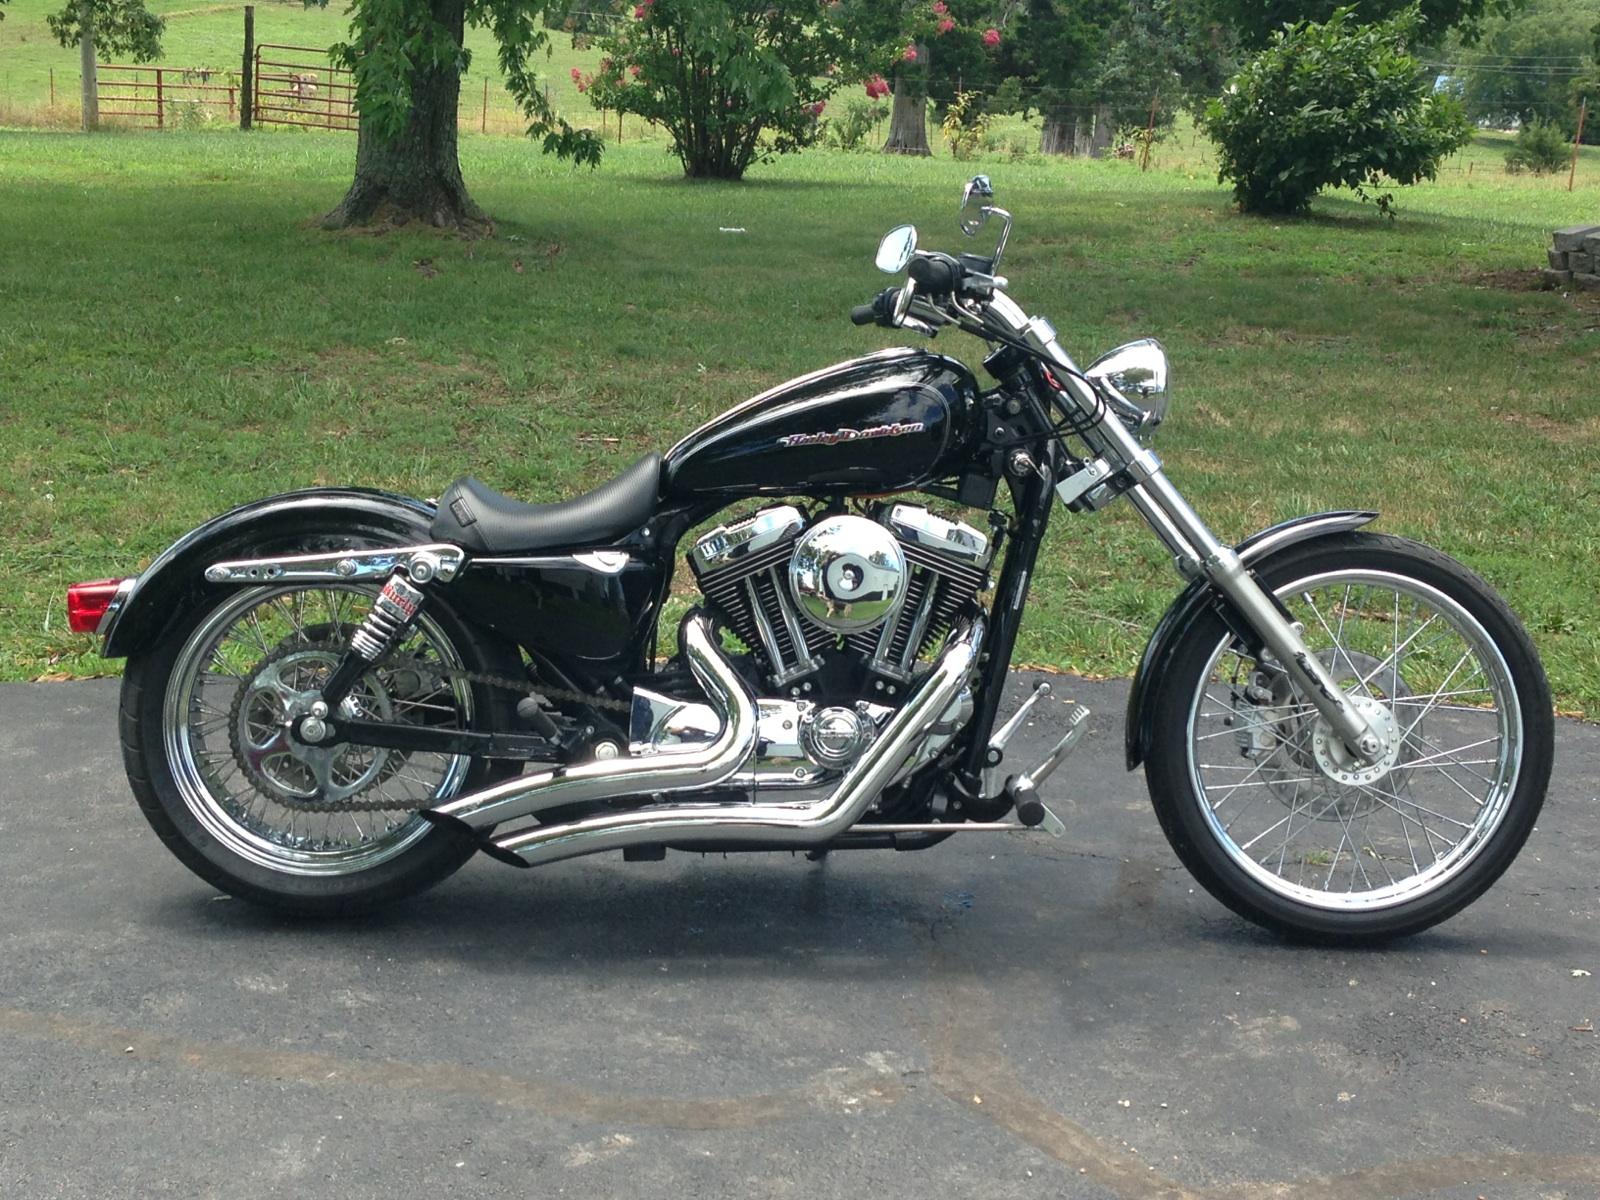 Chopper Kit Harley Davidson Photo Gallery